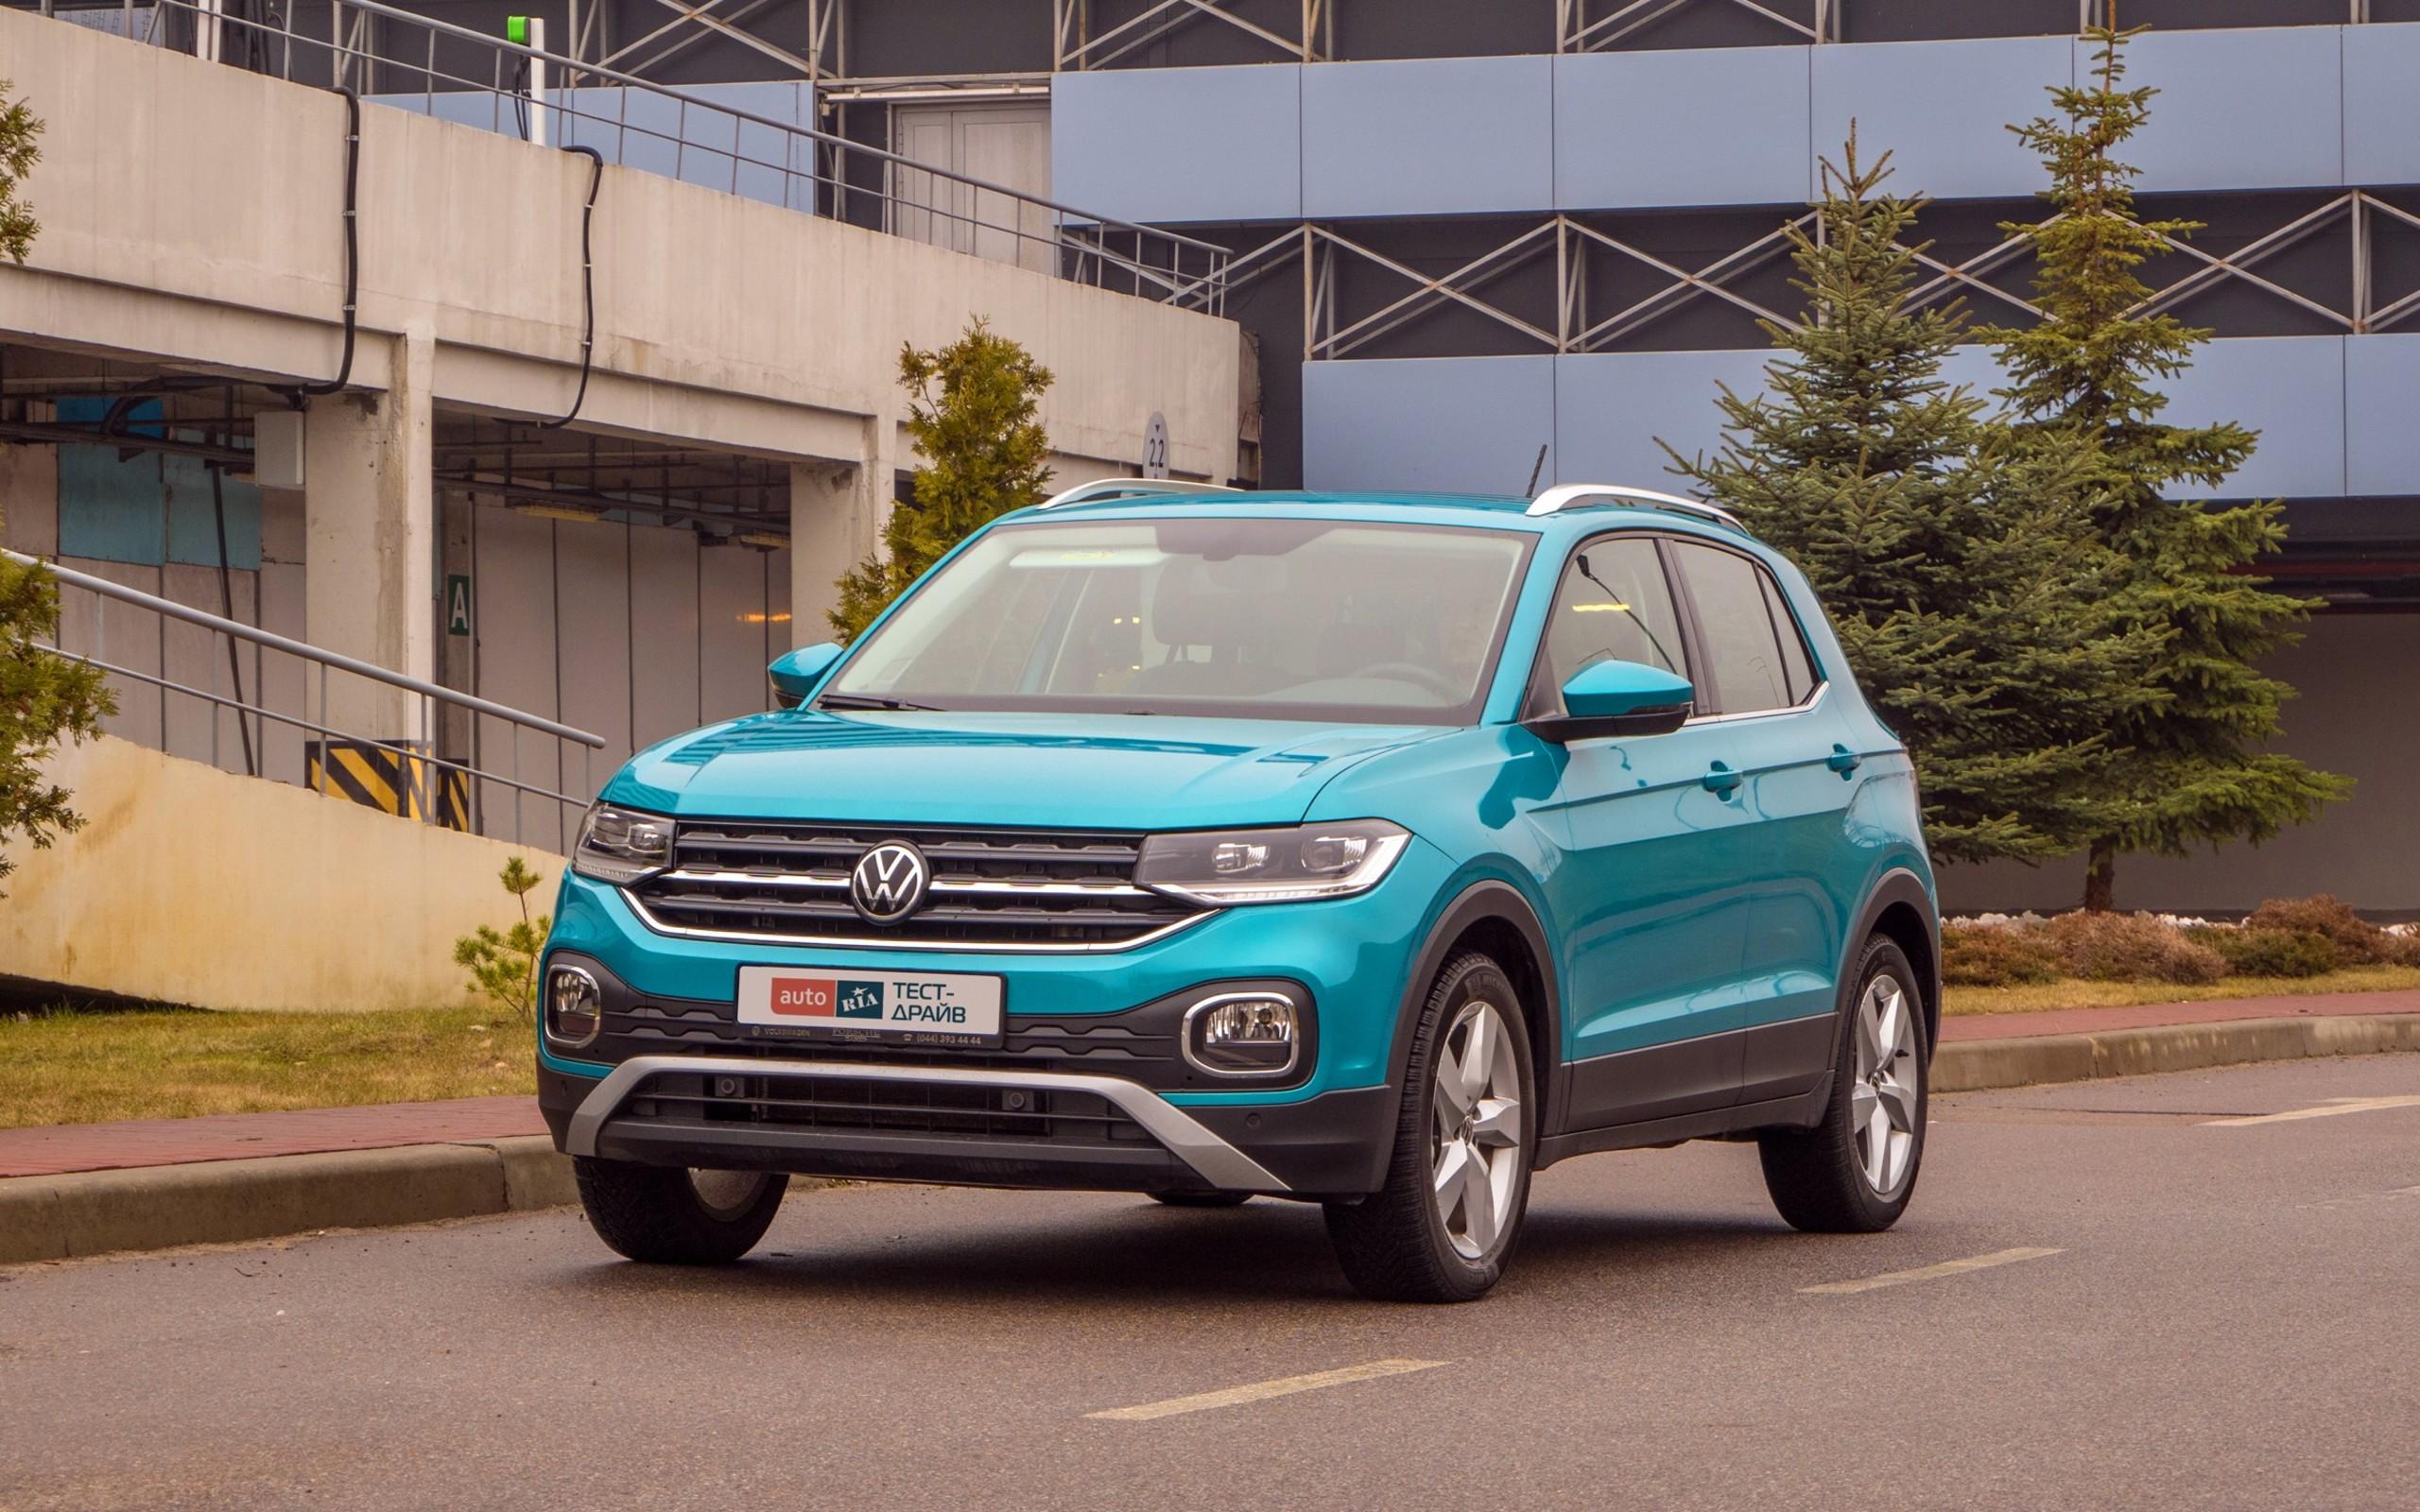 Тест-драйв Volkswagen T-Cross: славный малый